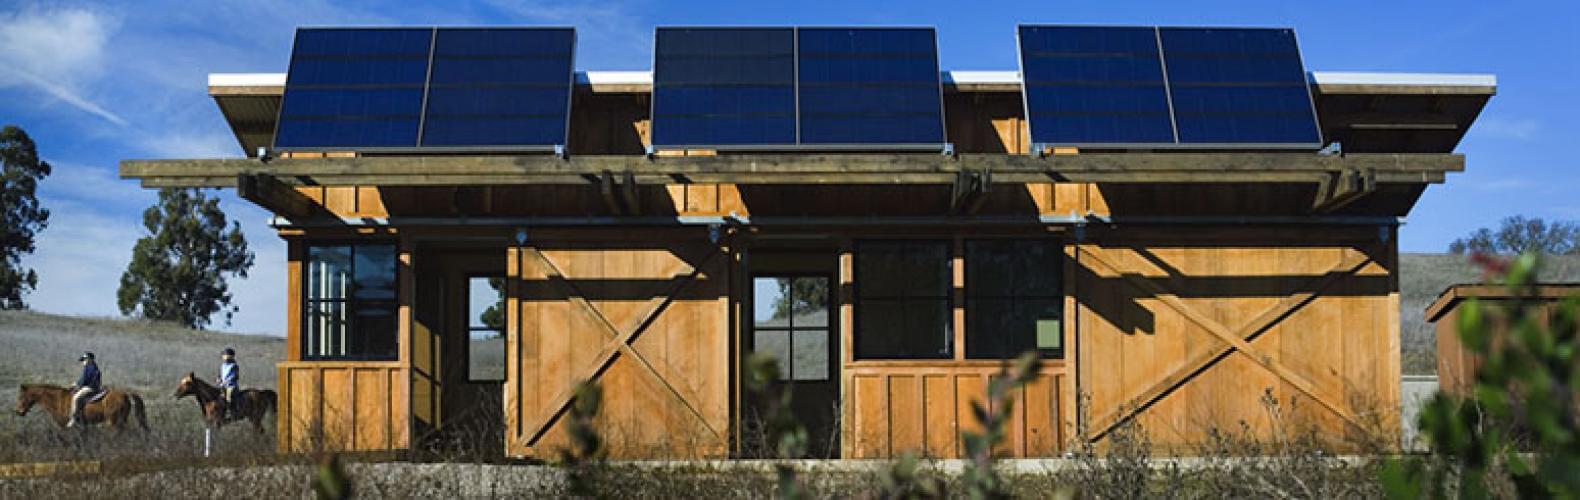 arastradero preserve gateway photovoltaic